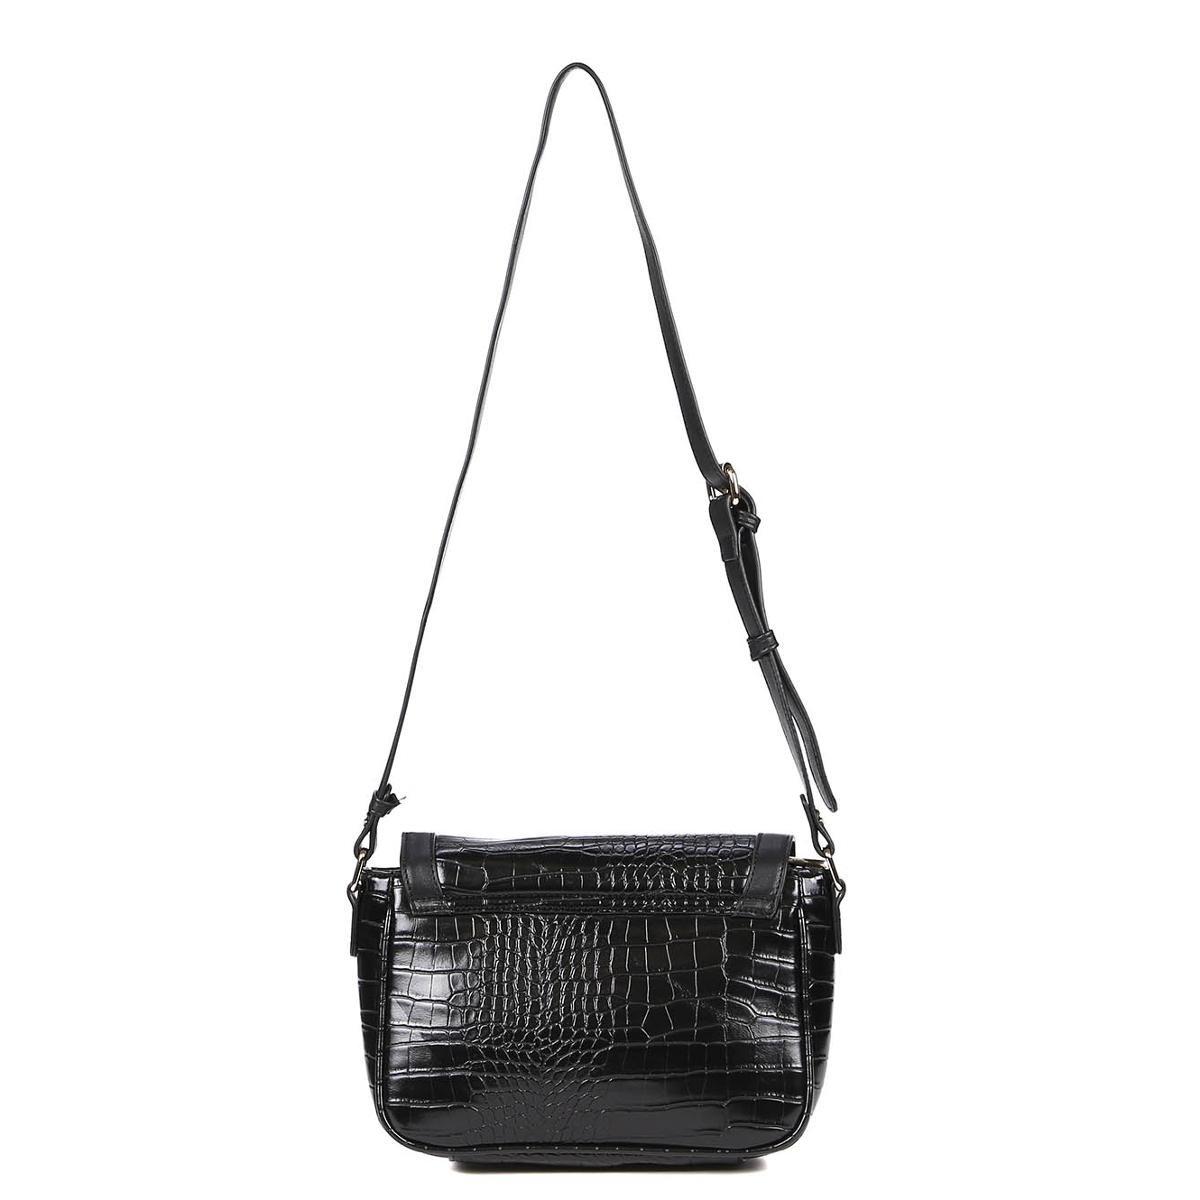 Bolsa Vogue Feminina - Preto - Compre Agora   Zattini 1938fc38ba